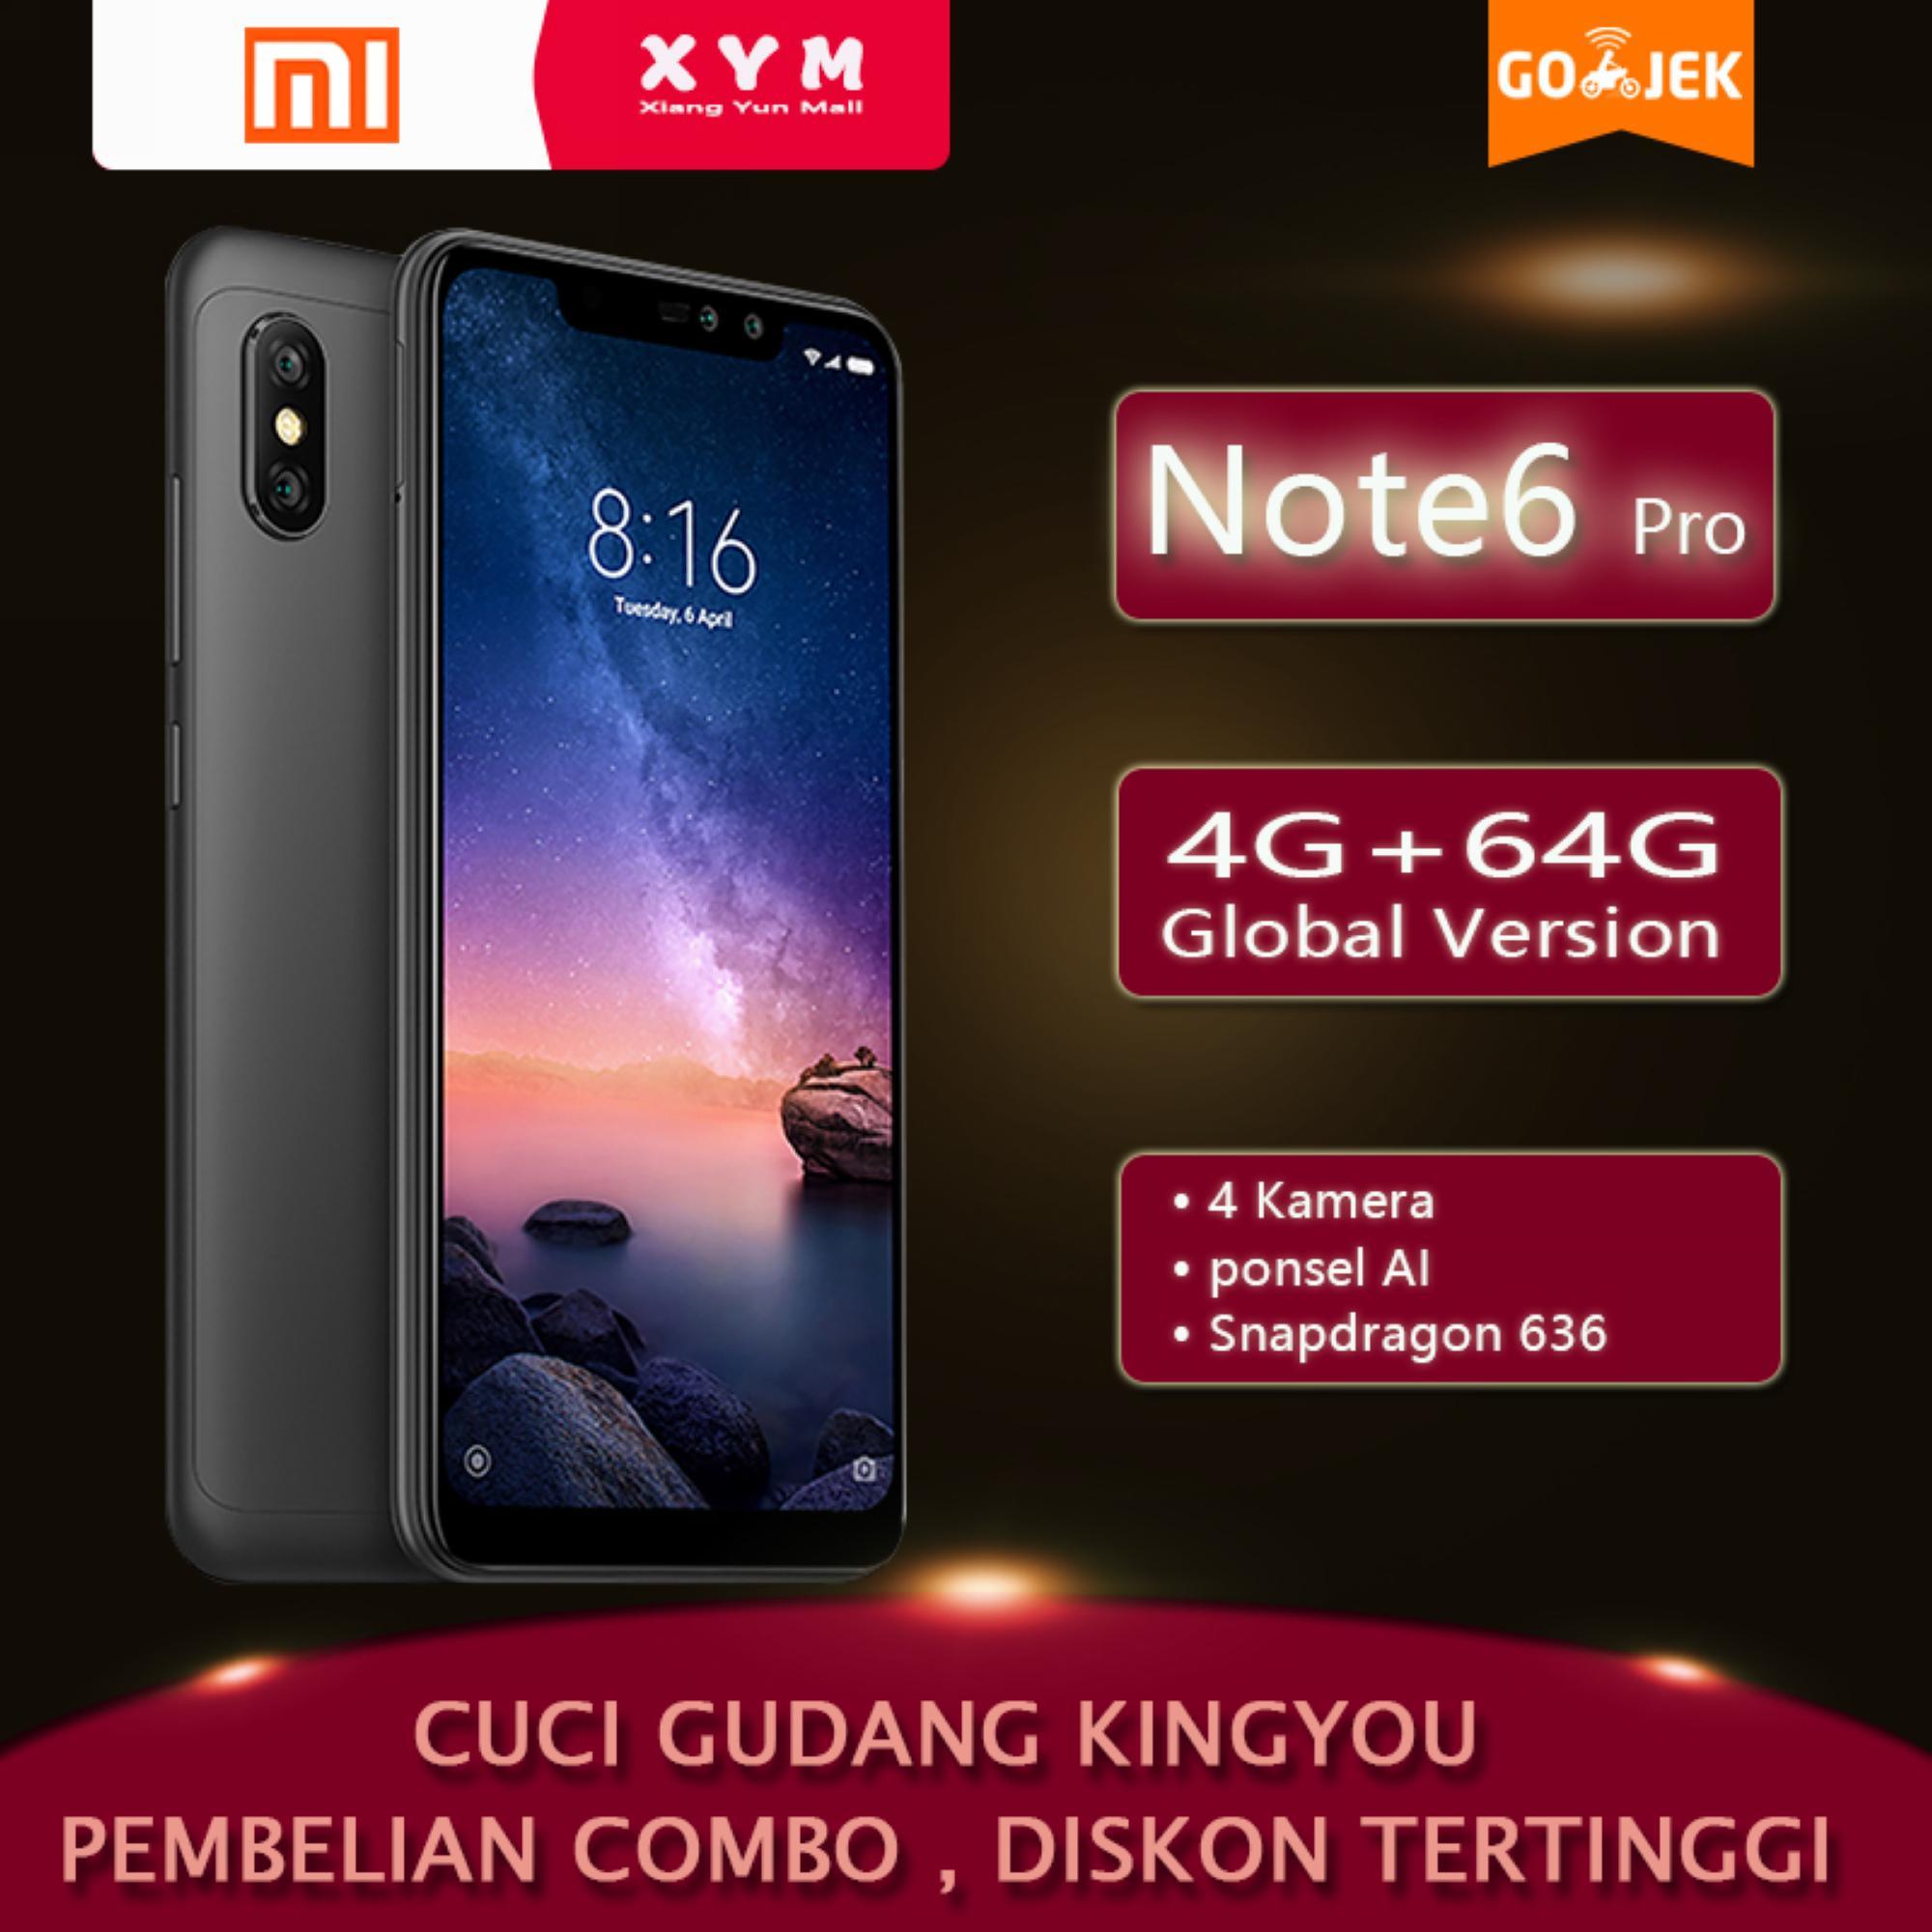 Jual Handphone Xiaomi Terbaru Redmi Note 4 3gb 64gb Grs Distributor 6 Pro 4g 64g Edisi Global Snapdragon 636 Ponsel Ai